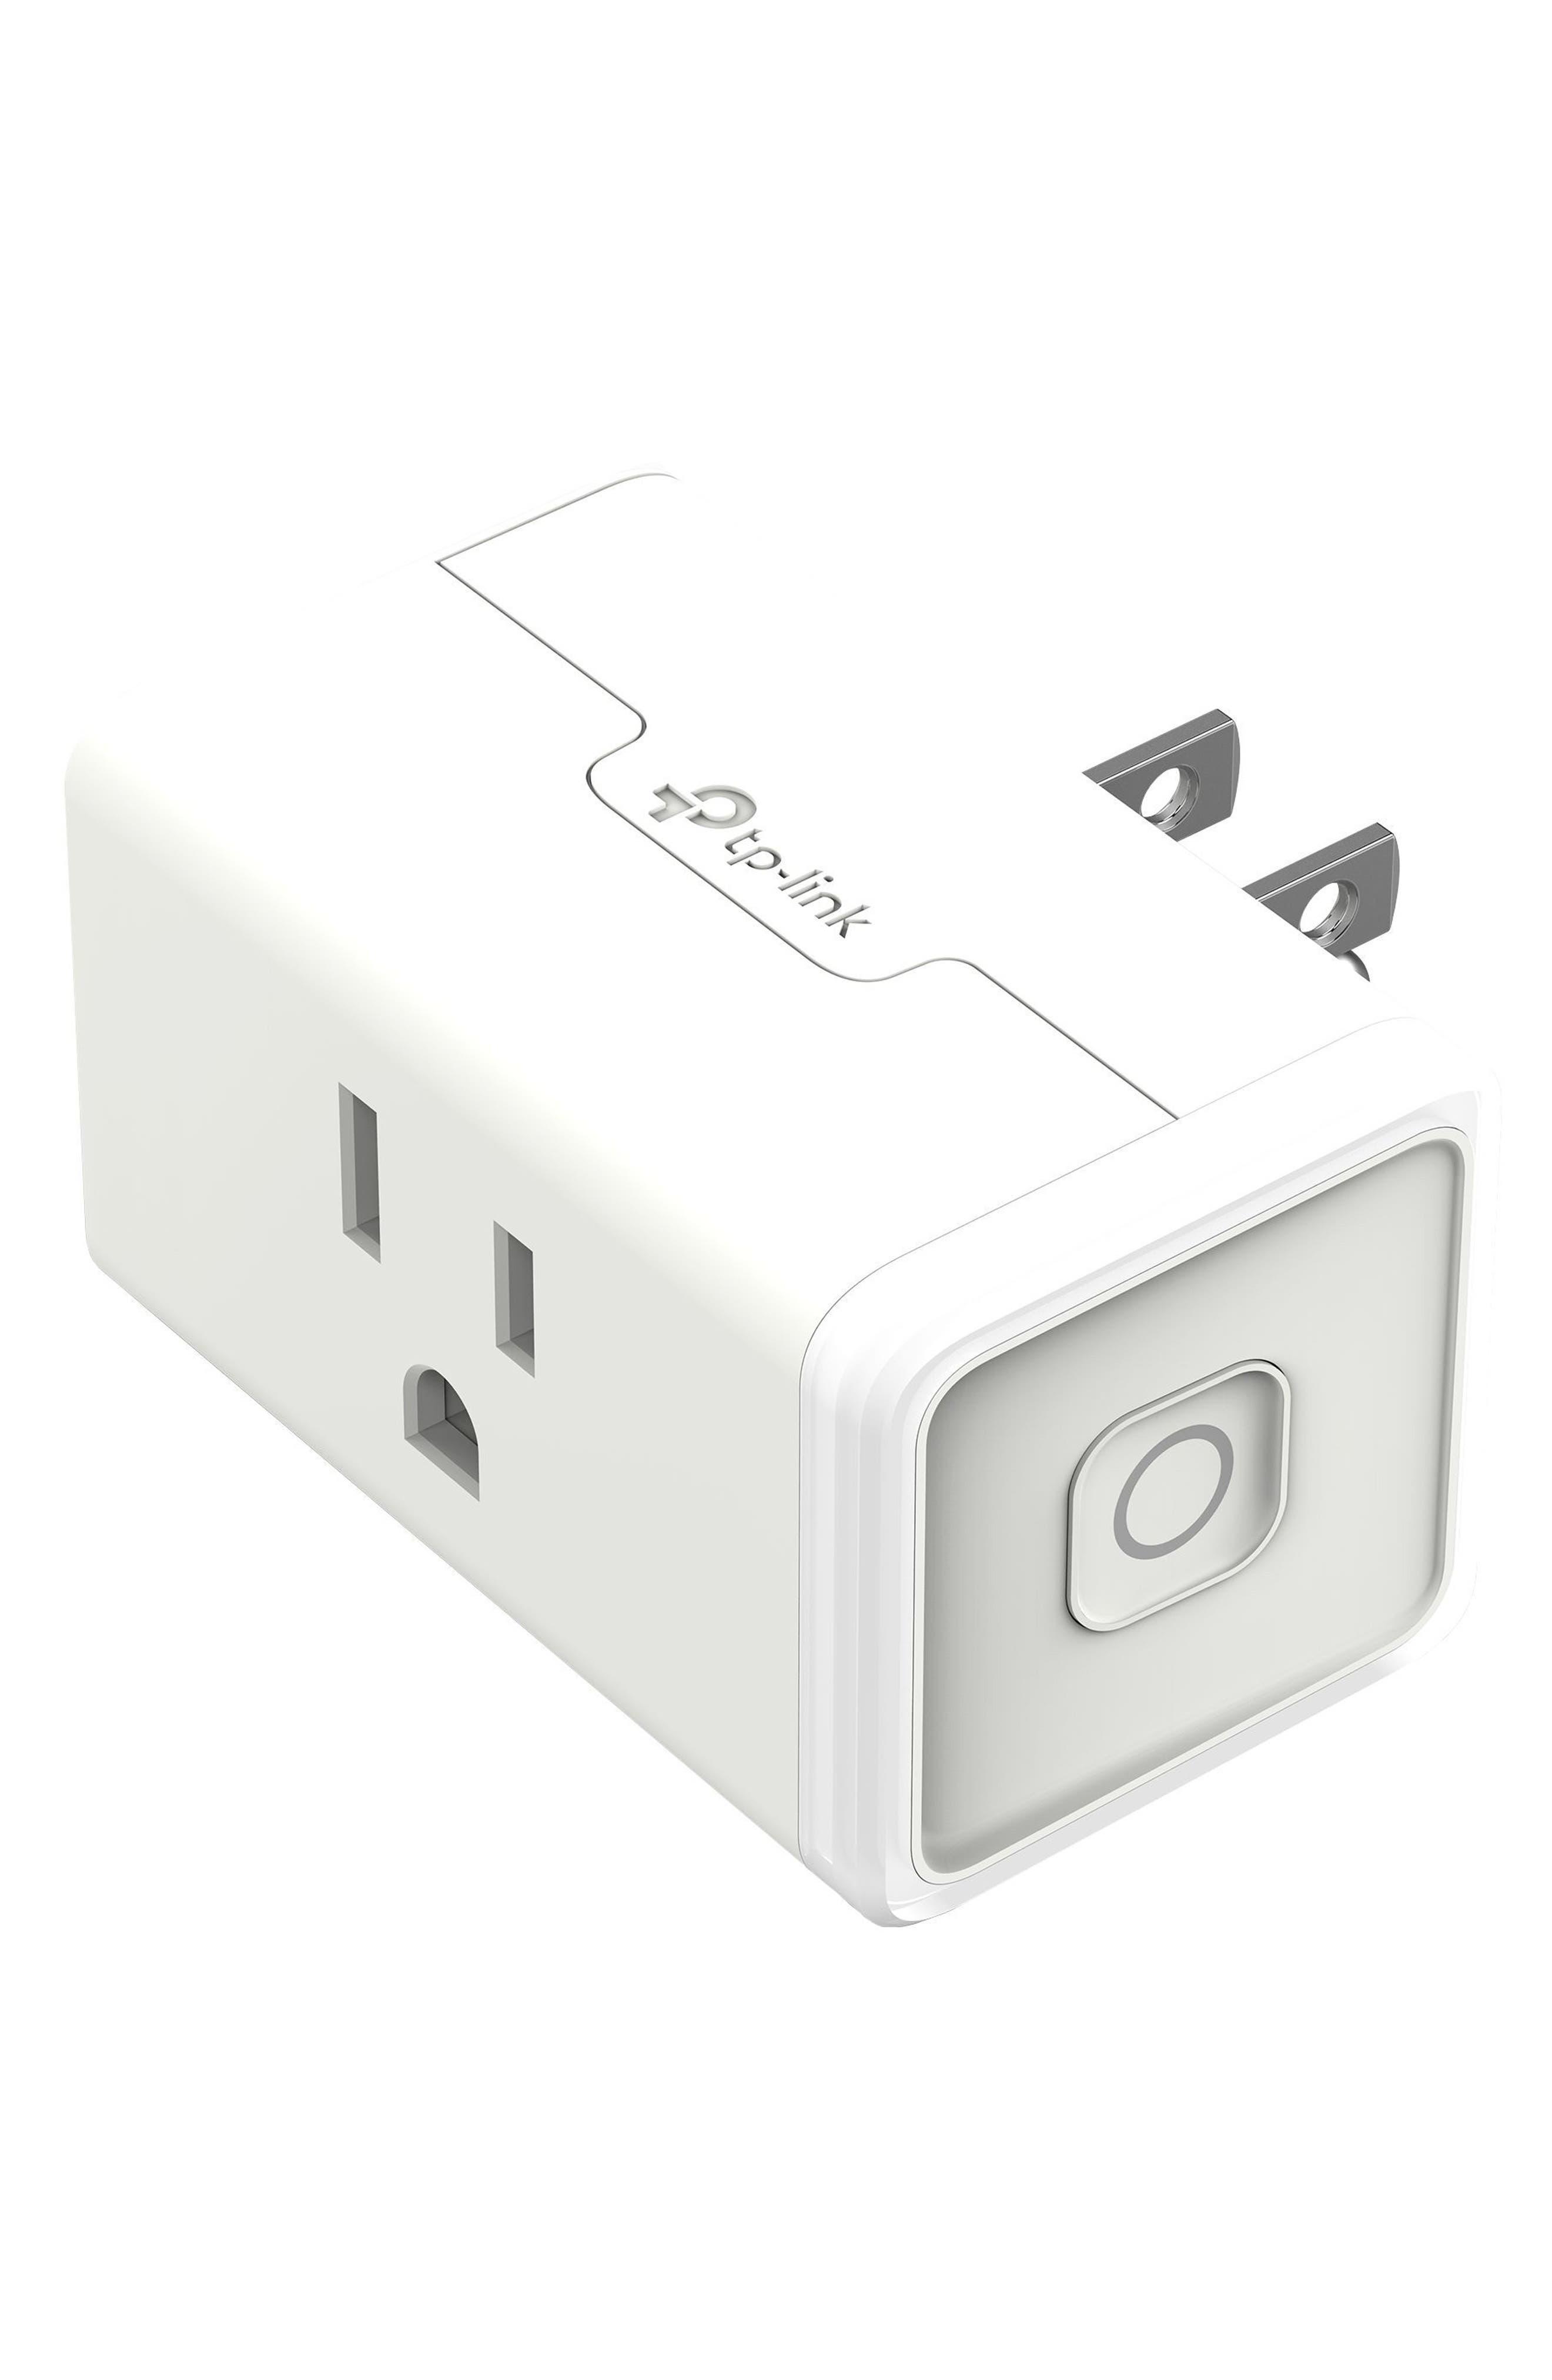 Alternate Image 1 Selected - TP-Link Smart Wi-Fi Mini Plug